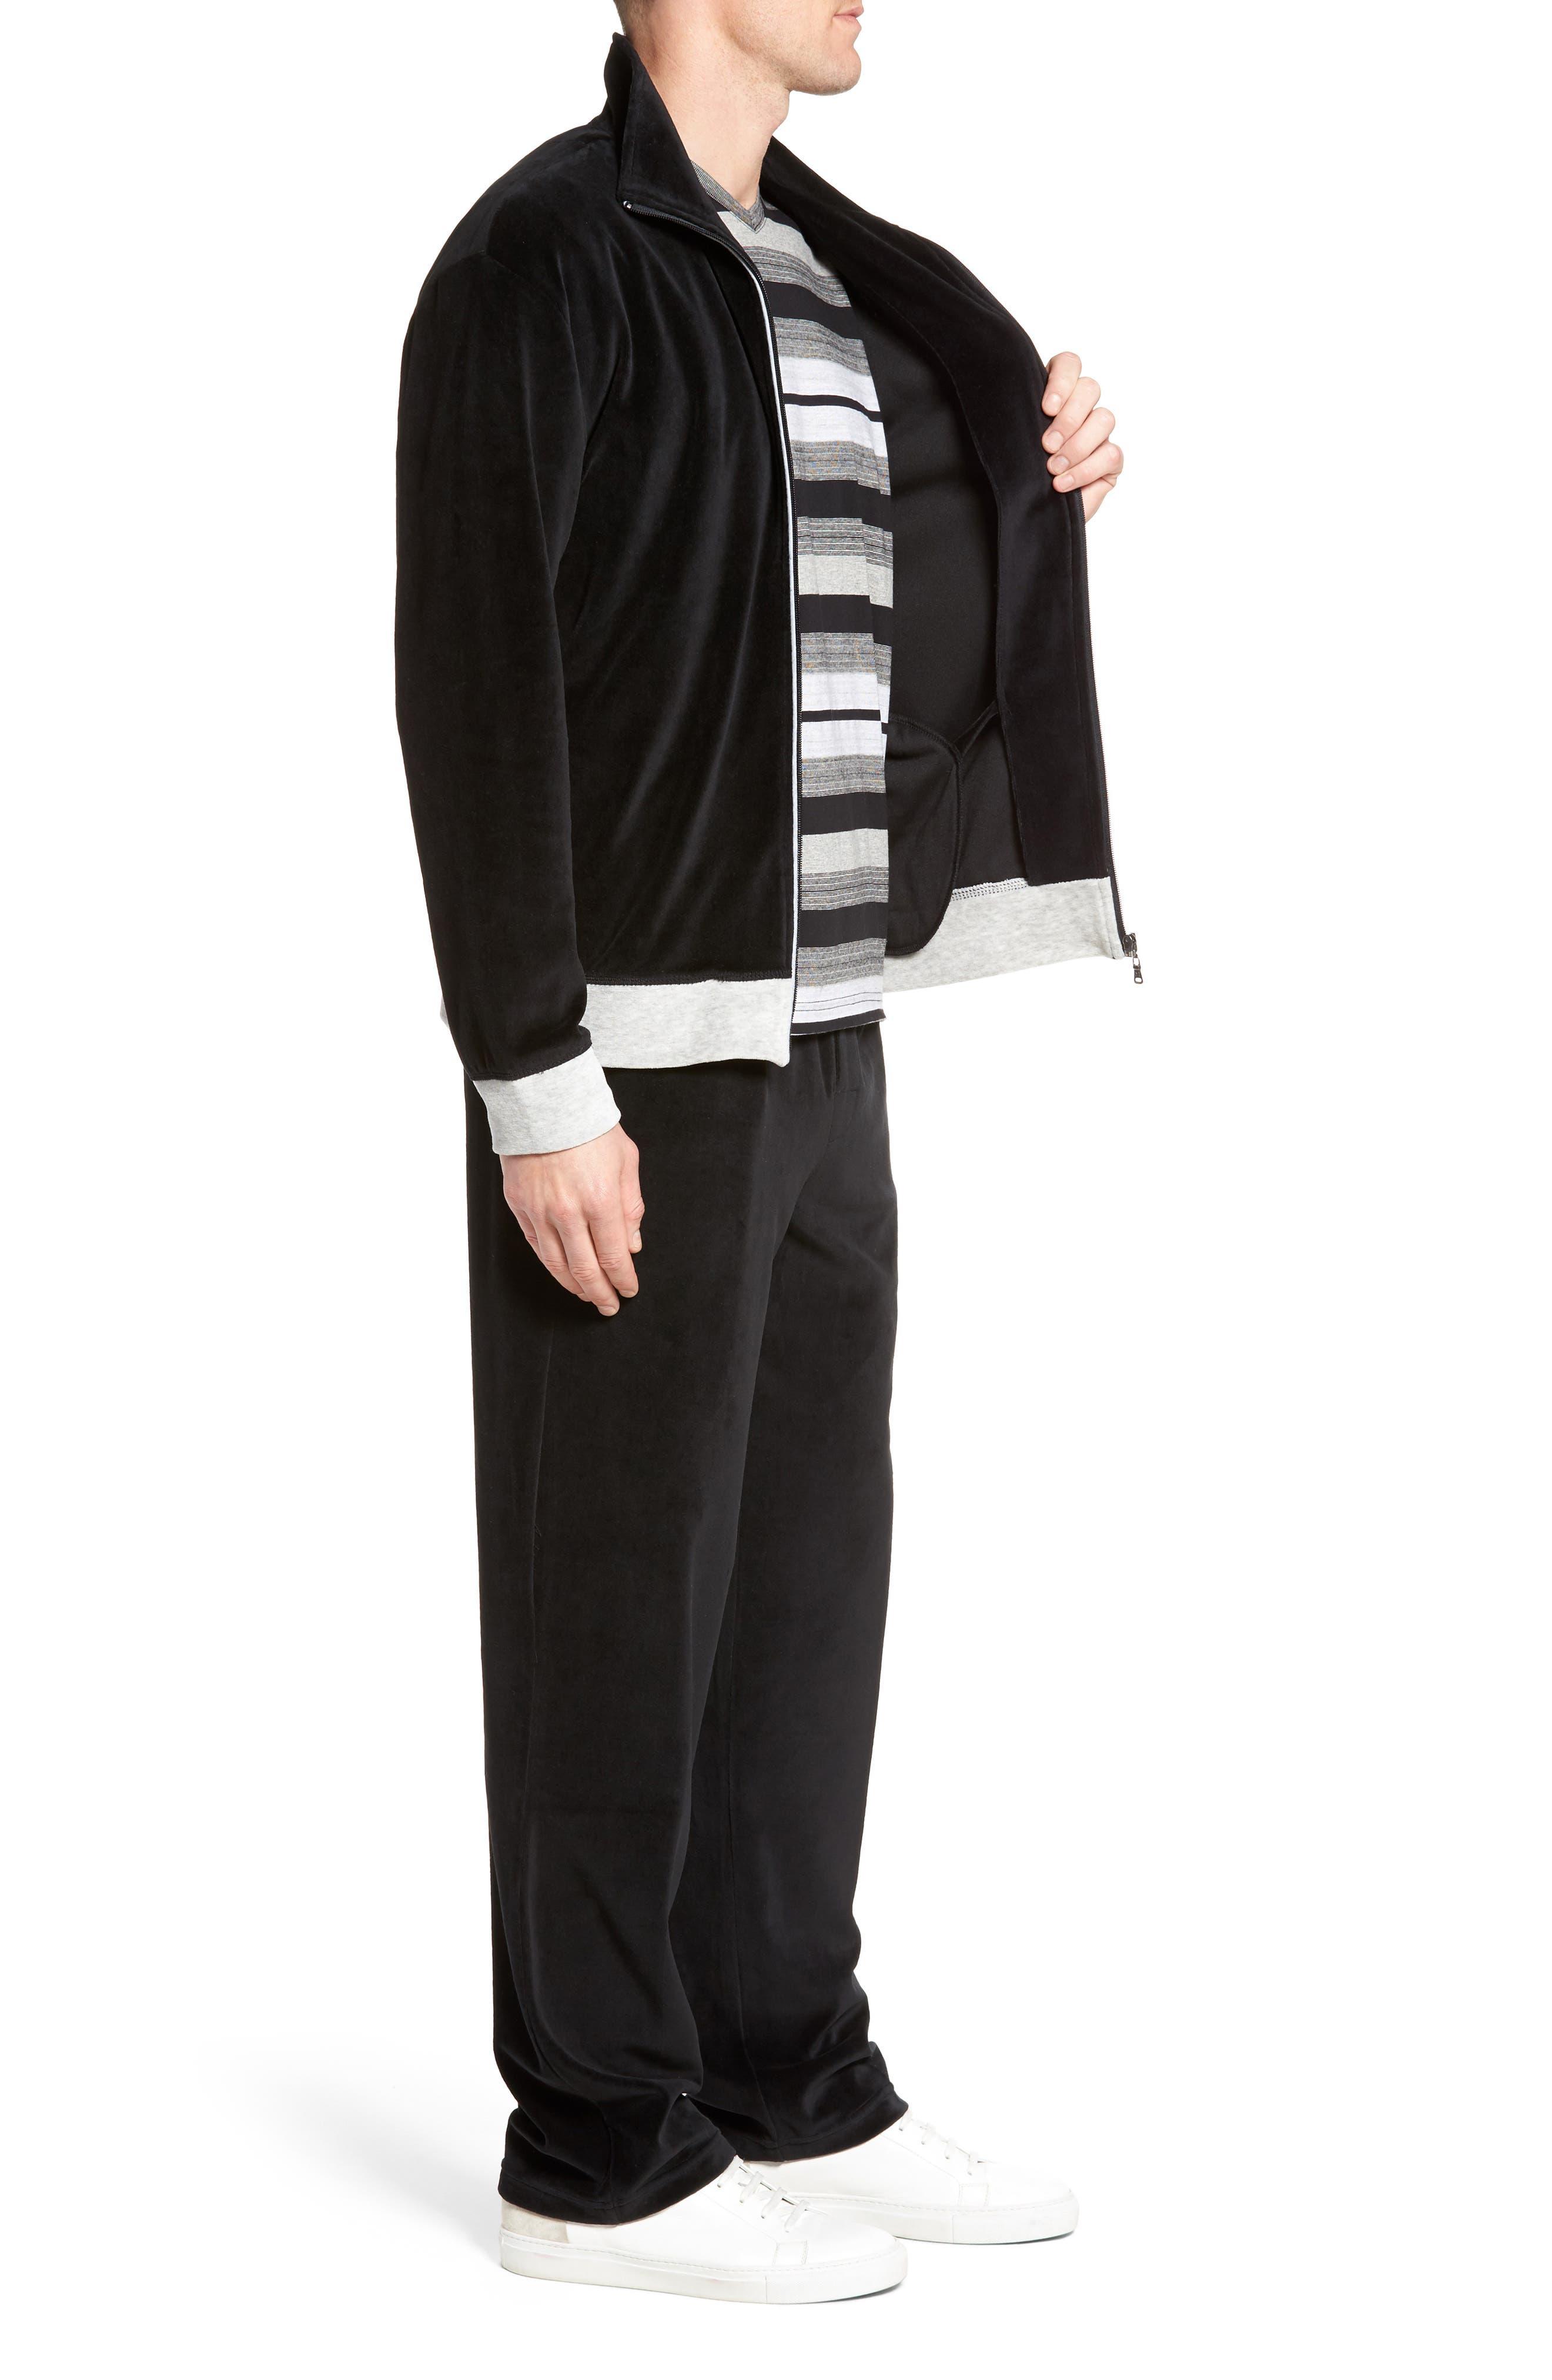 Strathcona Velour Warm-Up Suit,                             Alternate thumbnail 3, color,                             001